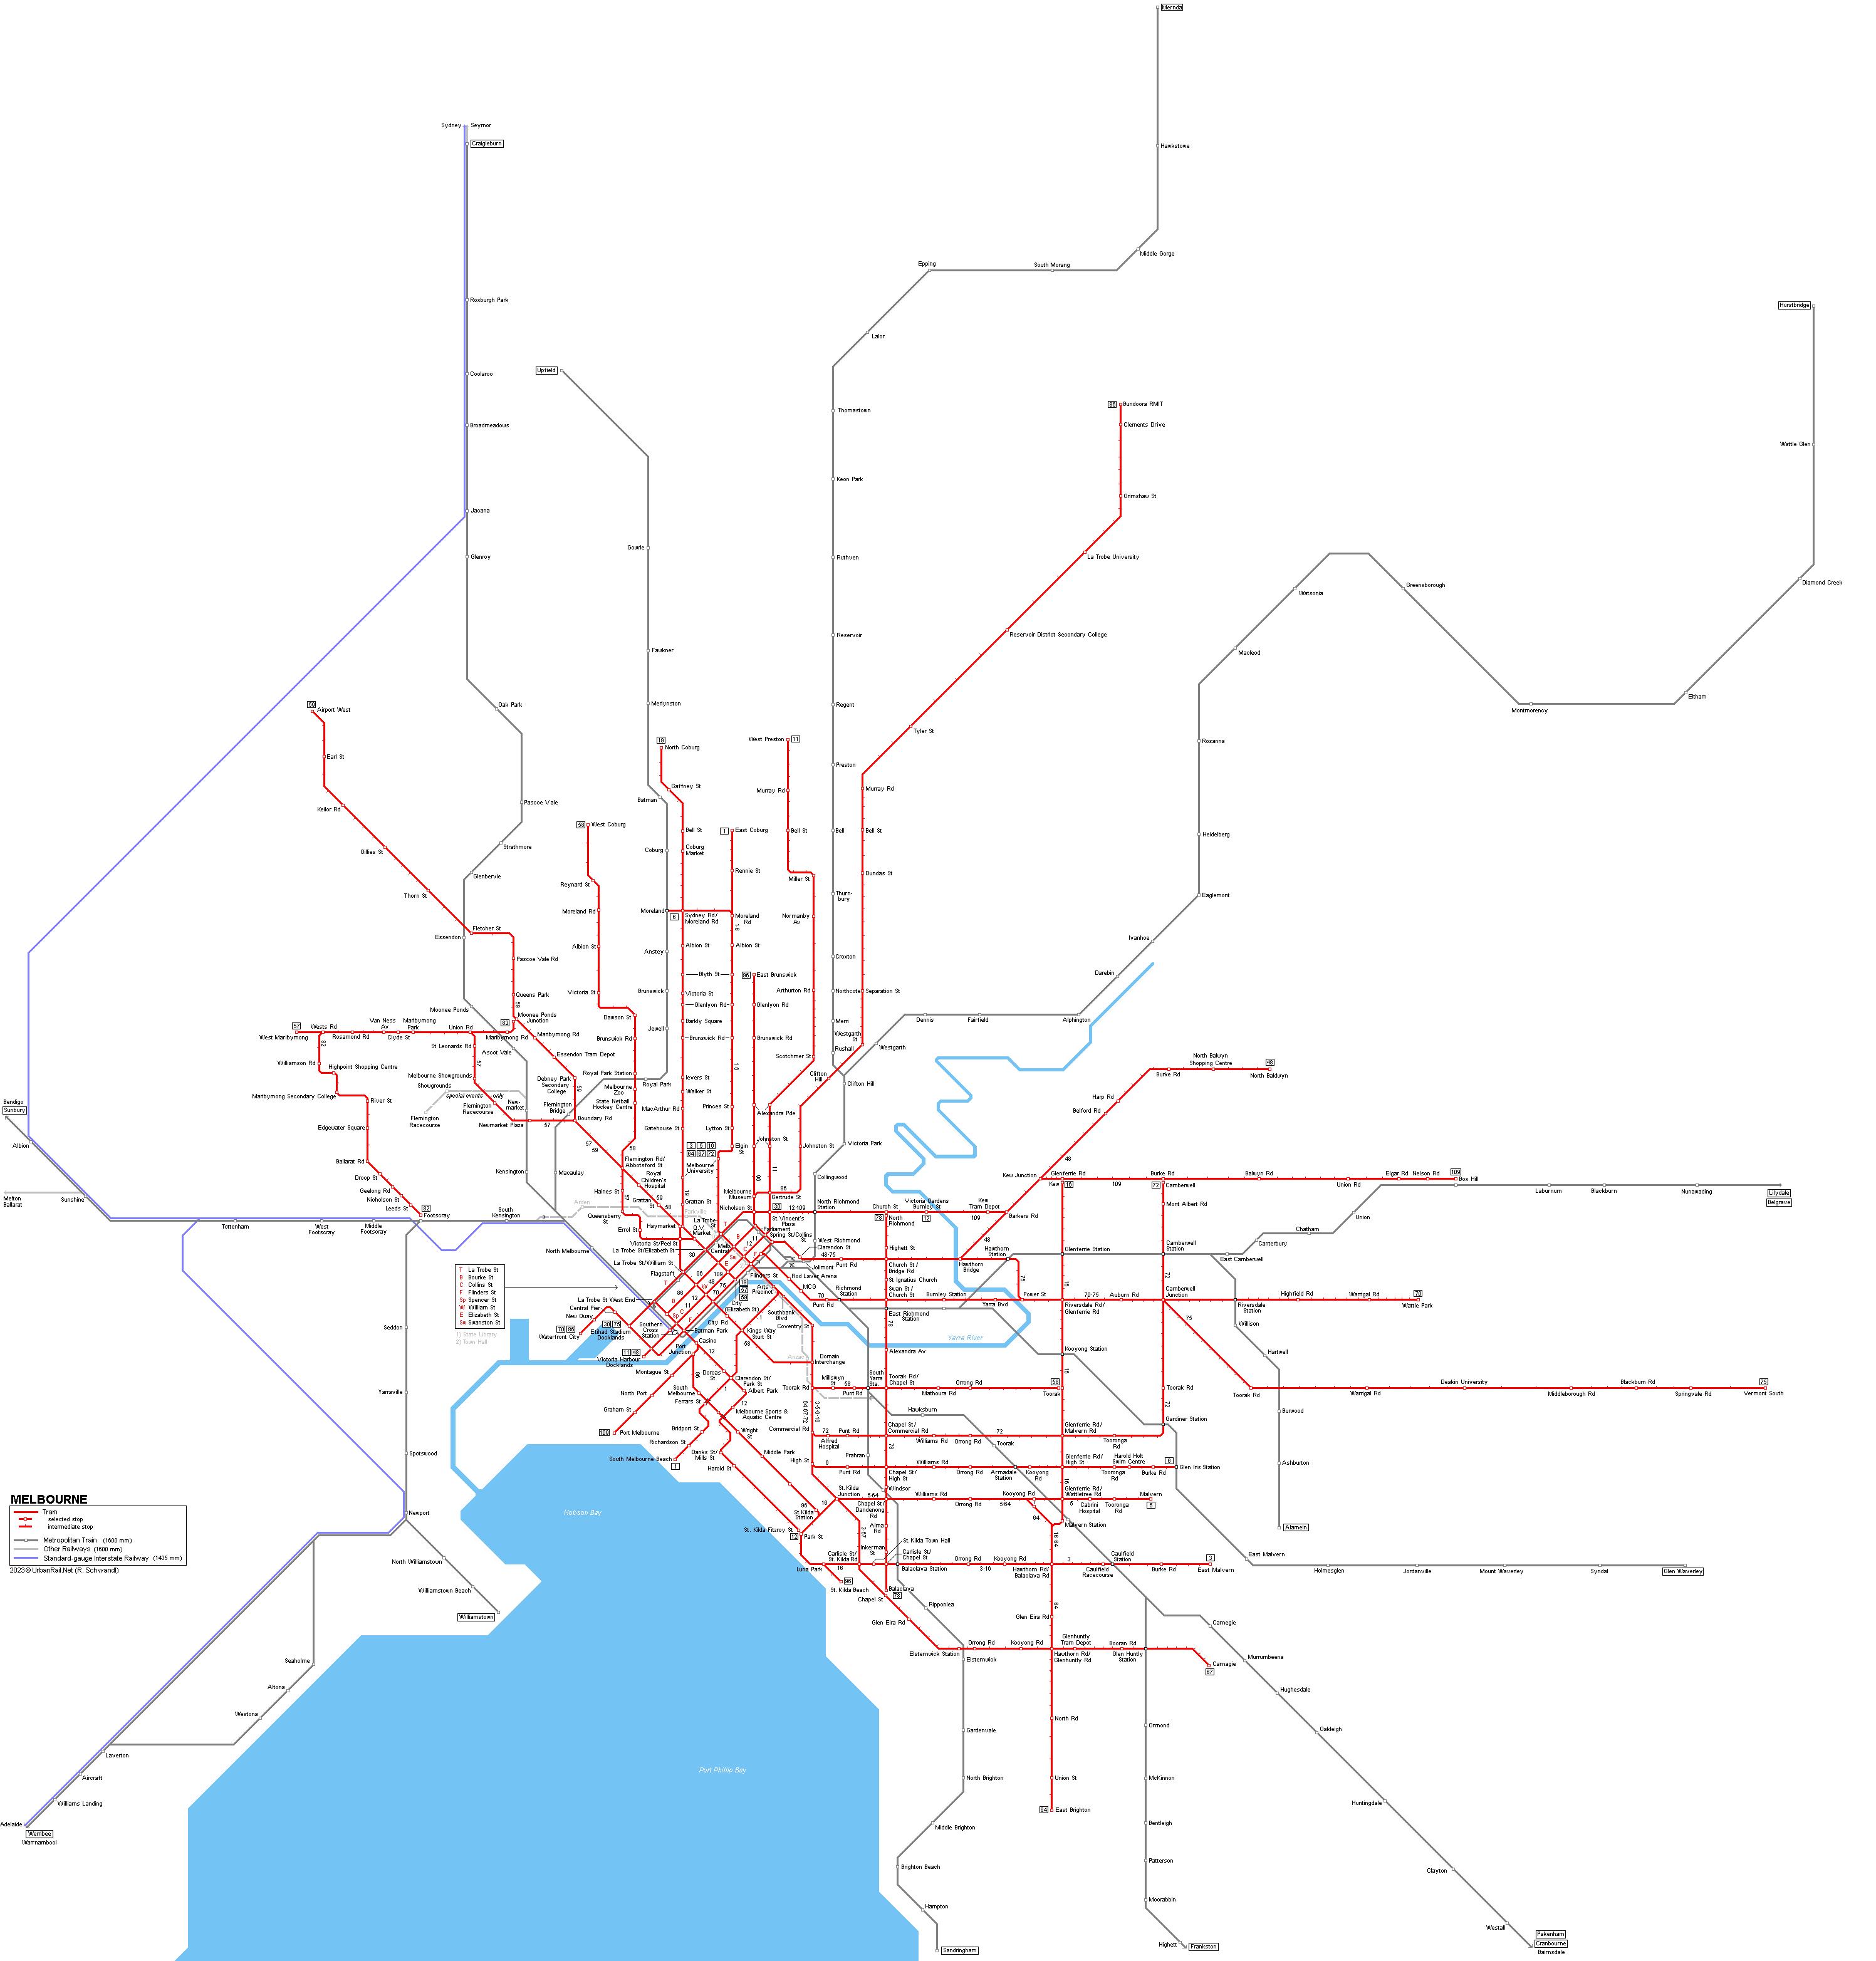 UrbanRailNet Melbourne Tram Train Map